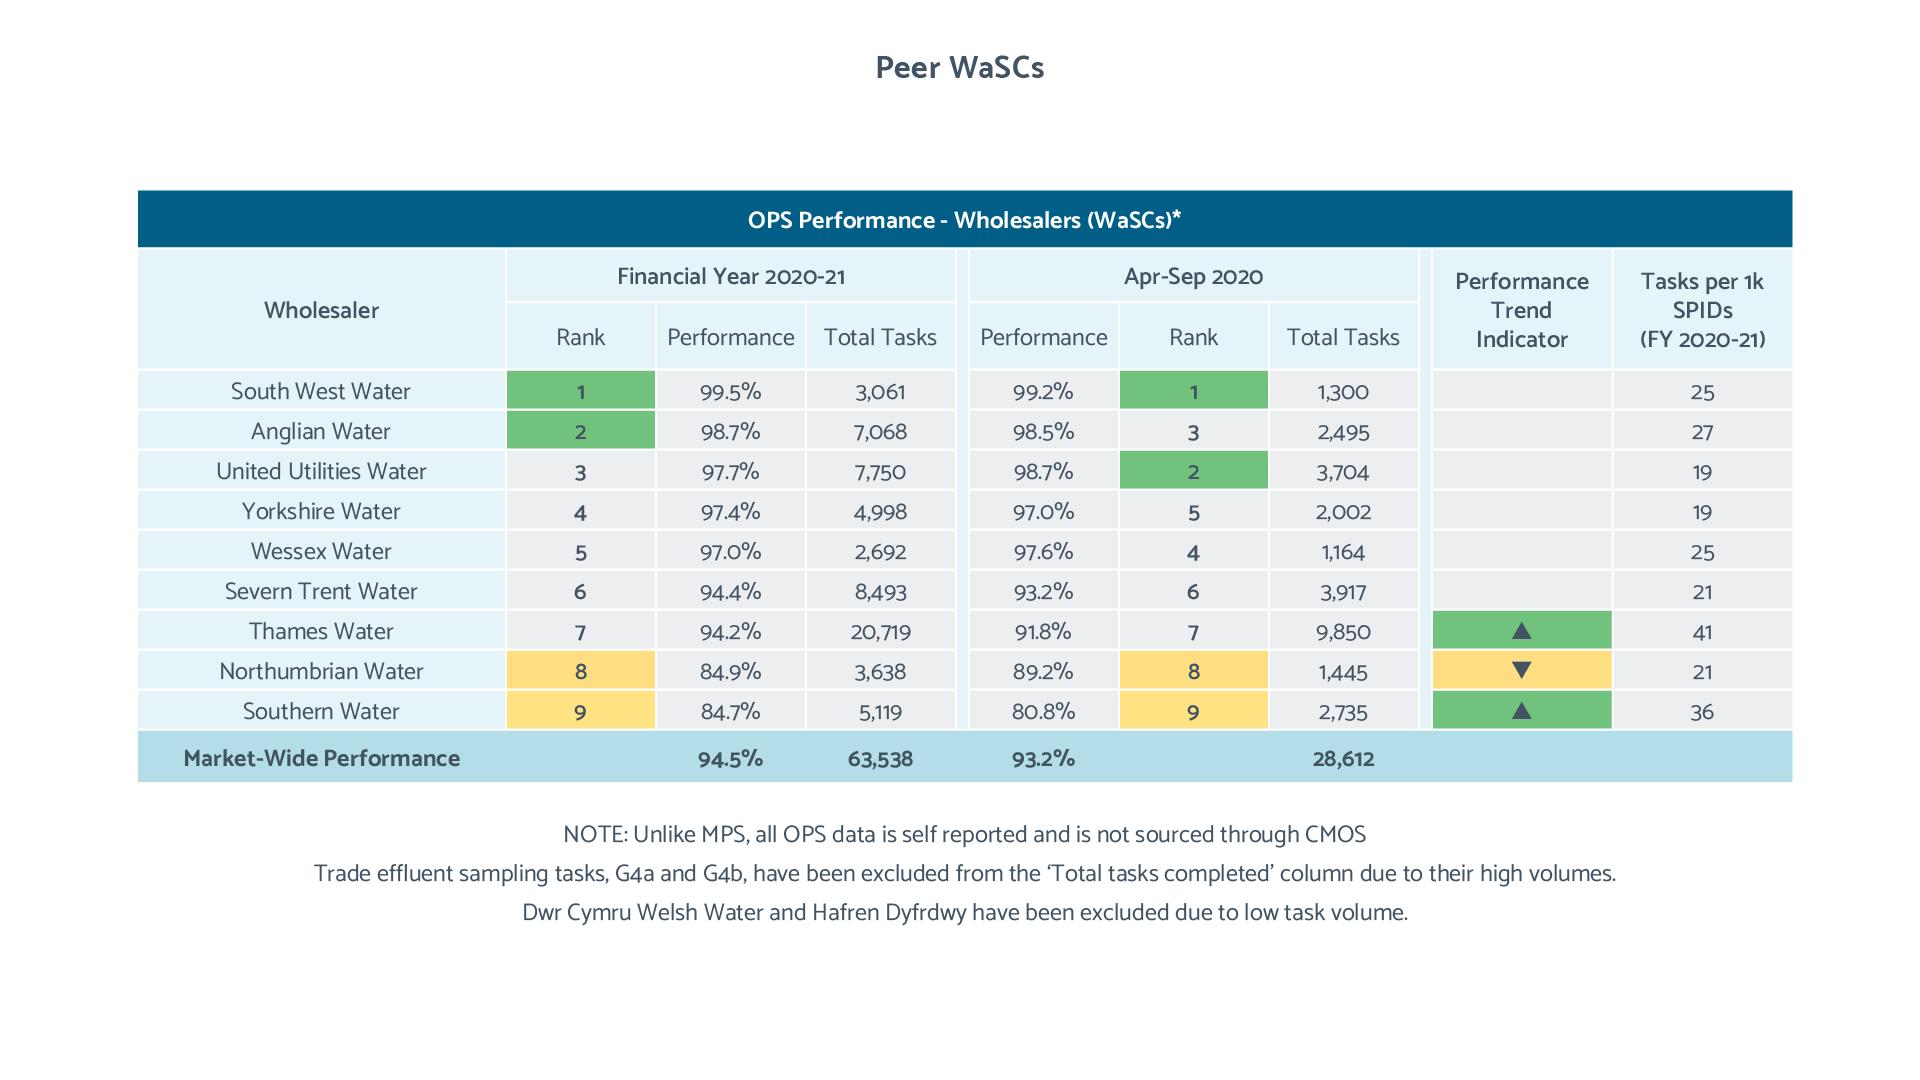 OPS Peer Comparison tables (WaSCs)